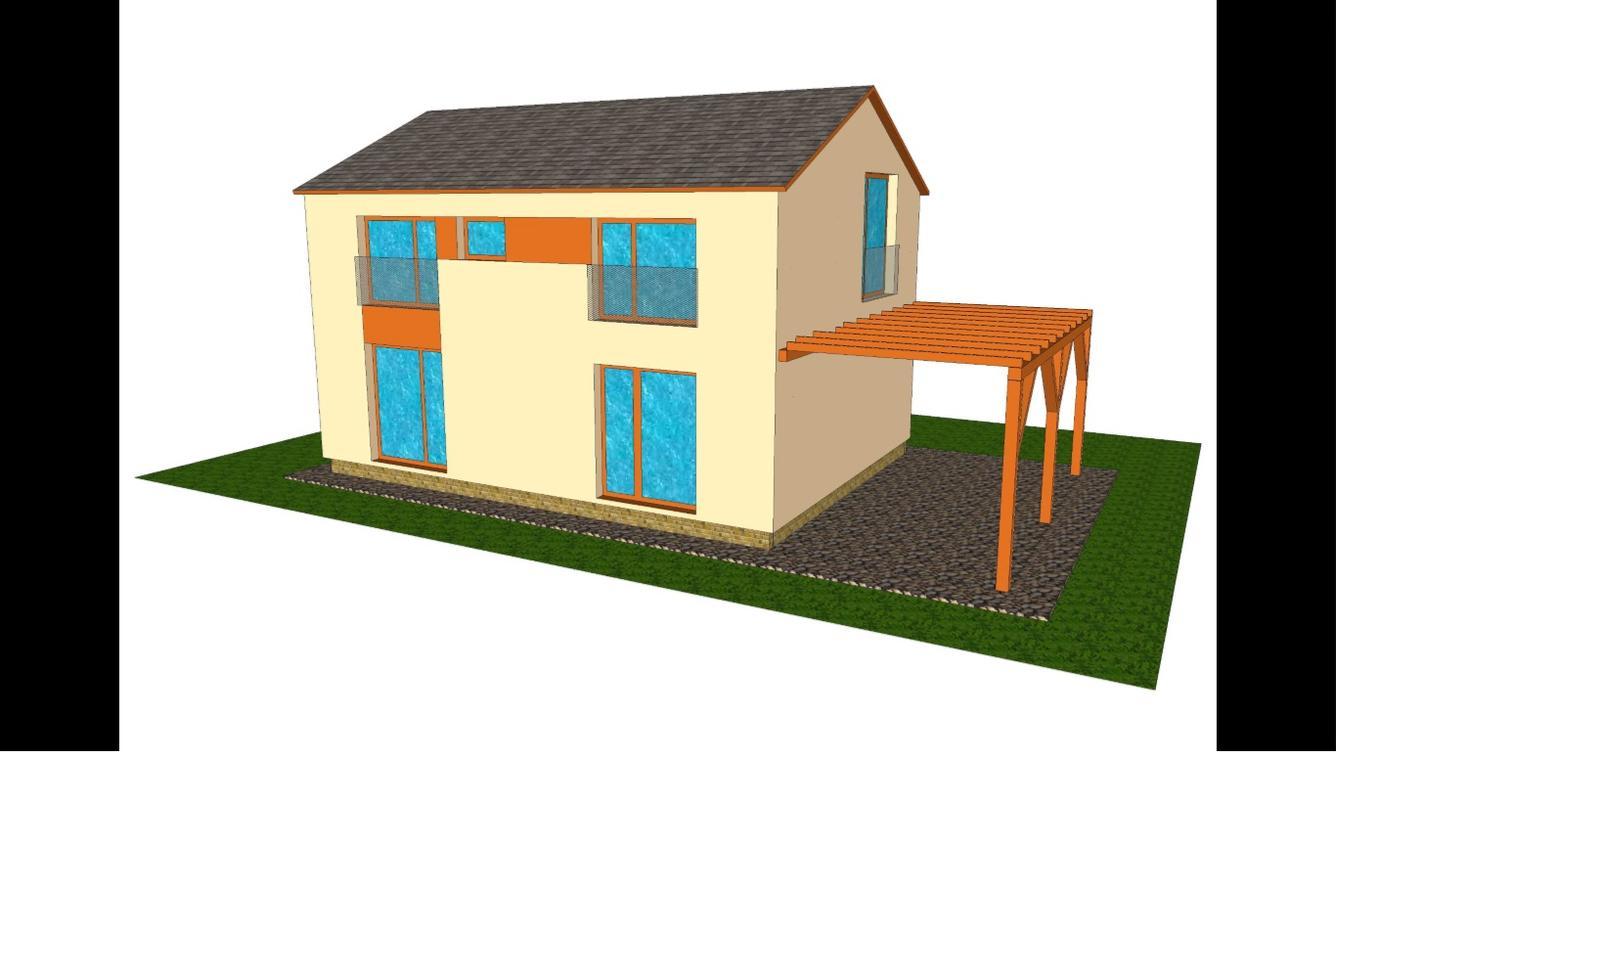 Varianta s terasovými dveřmi... - Obrázek č. 1